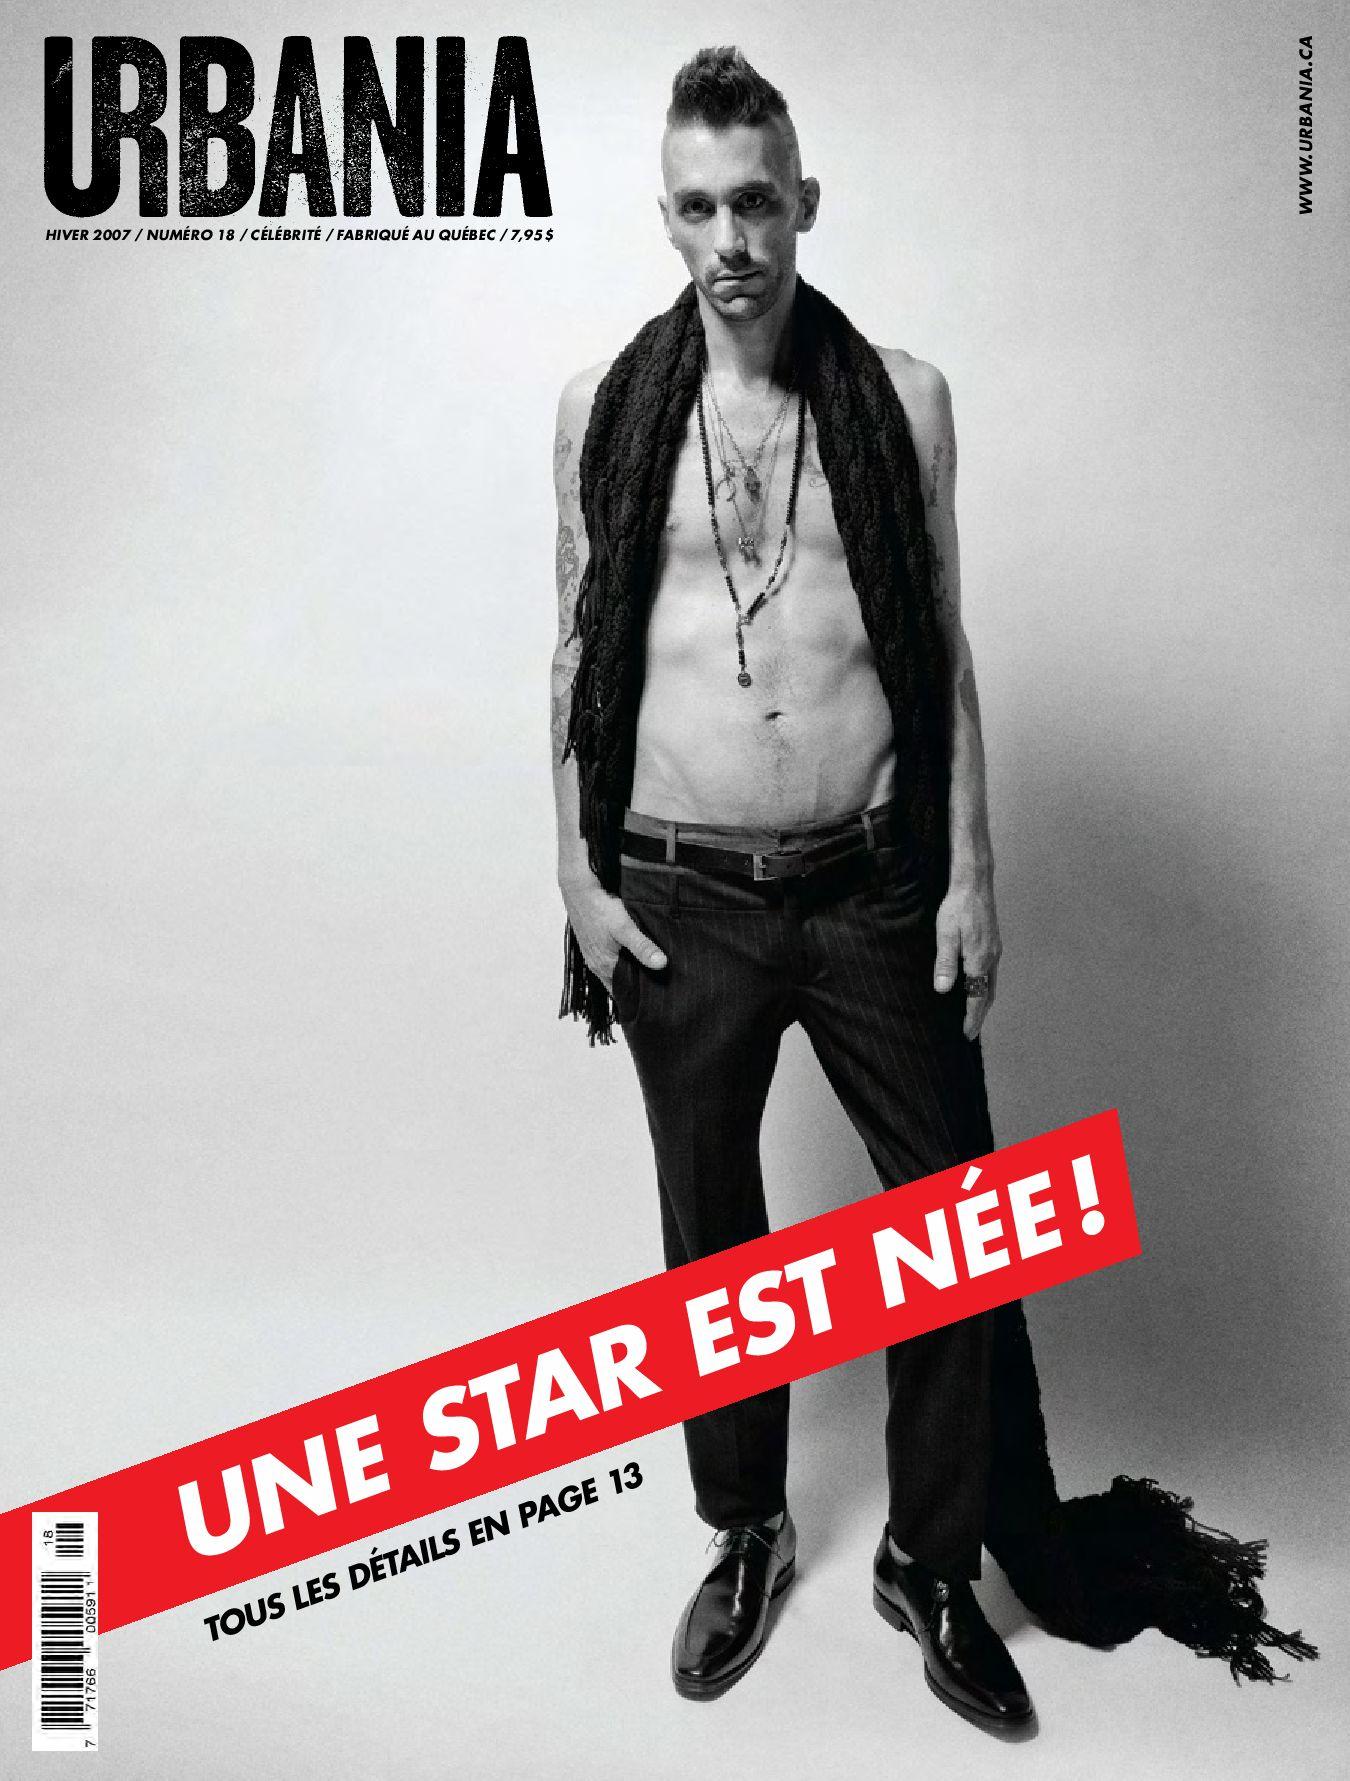 Celebrites Dans Le Porno urbania #18 célébritéplamarre - issuu